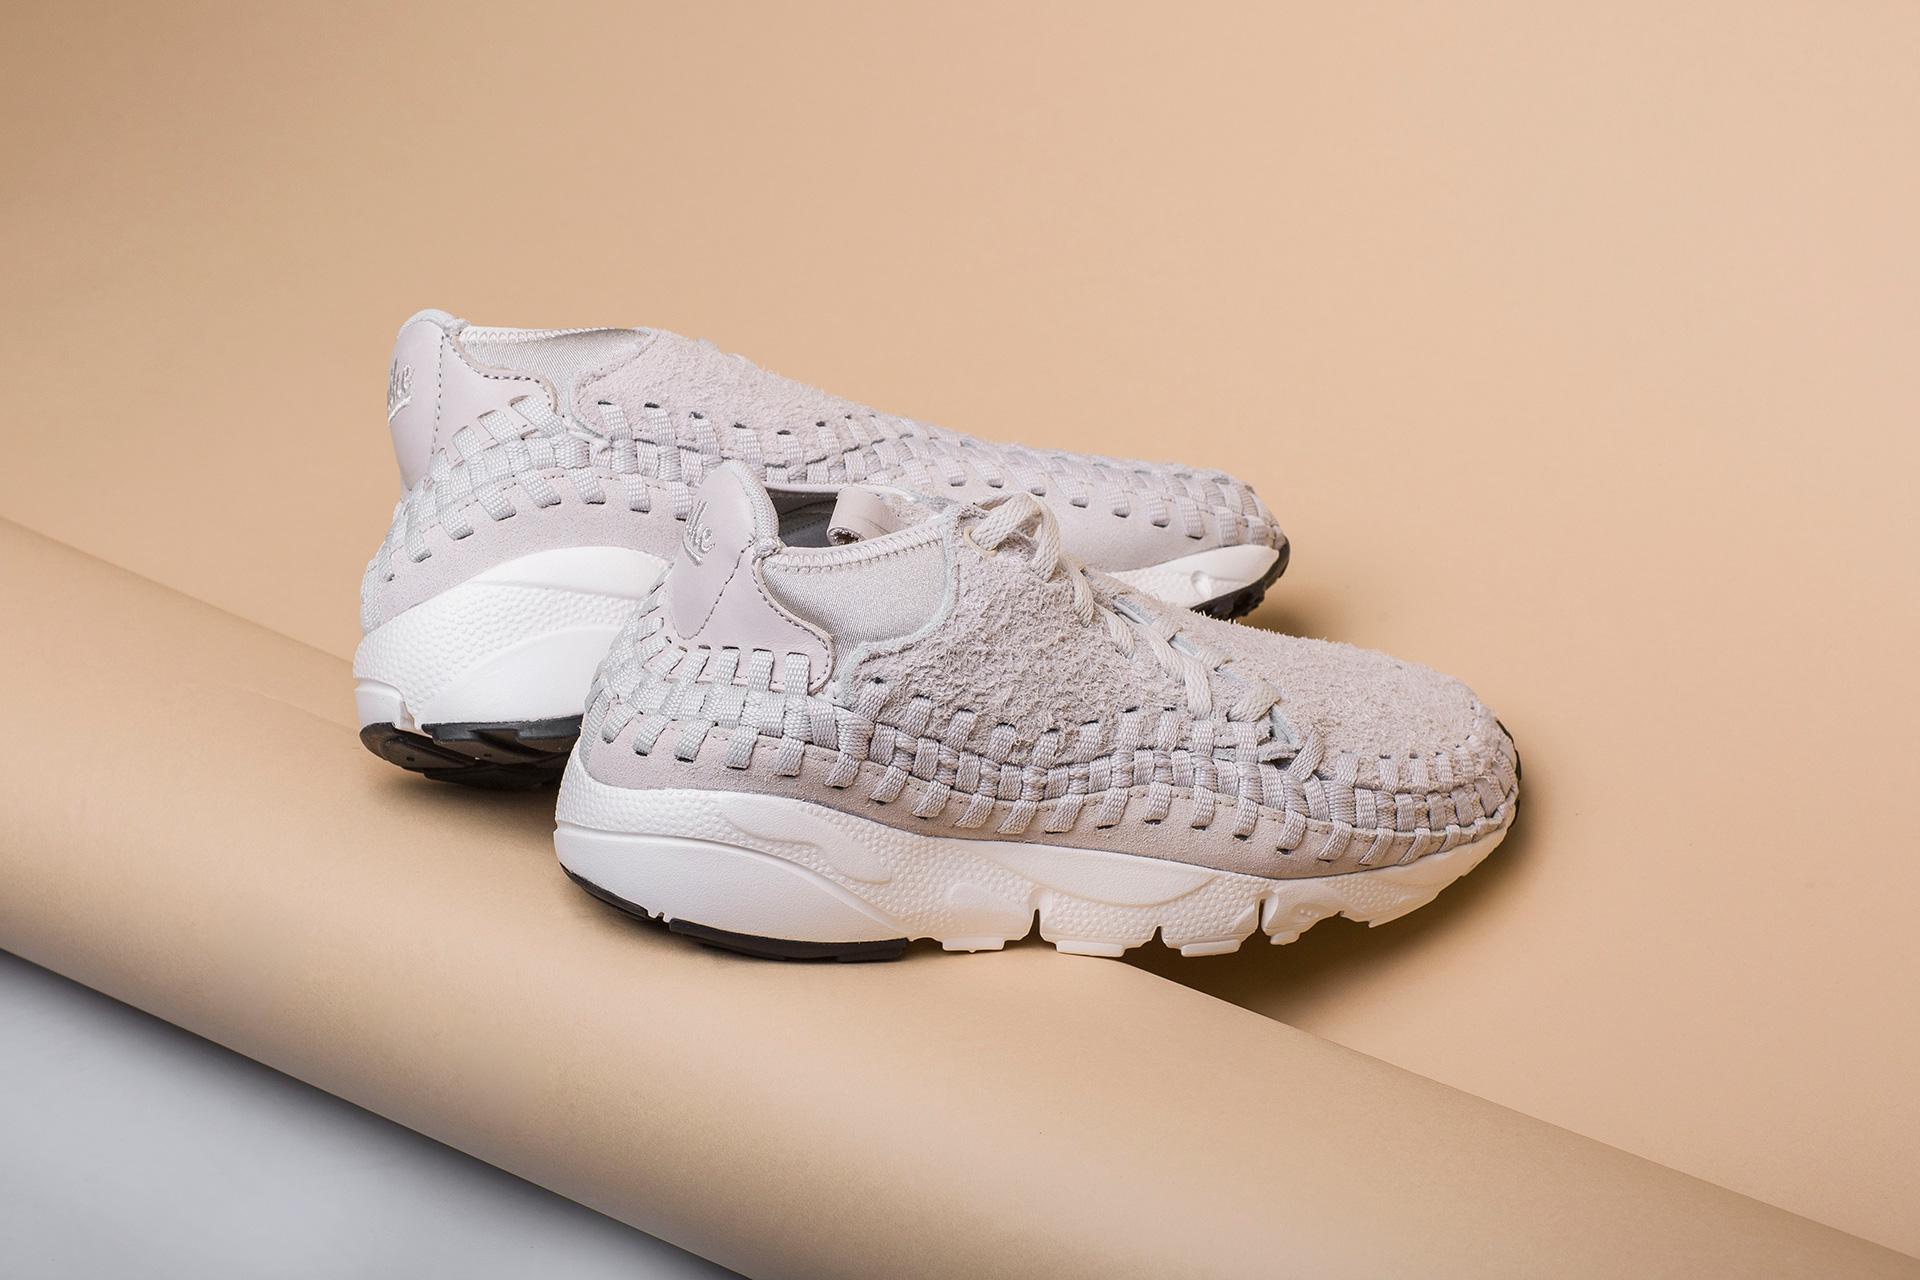 pretty nice 53cbd 2d72d ... Купить мужские бежевыые кроссовки Nike Footscape Woven Chukka QS - фото  3 картинки ...